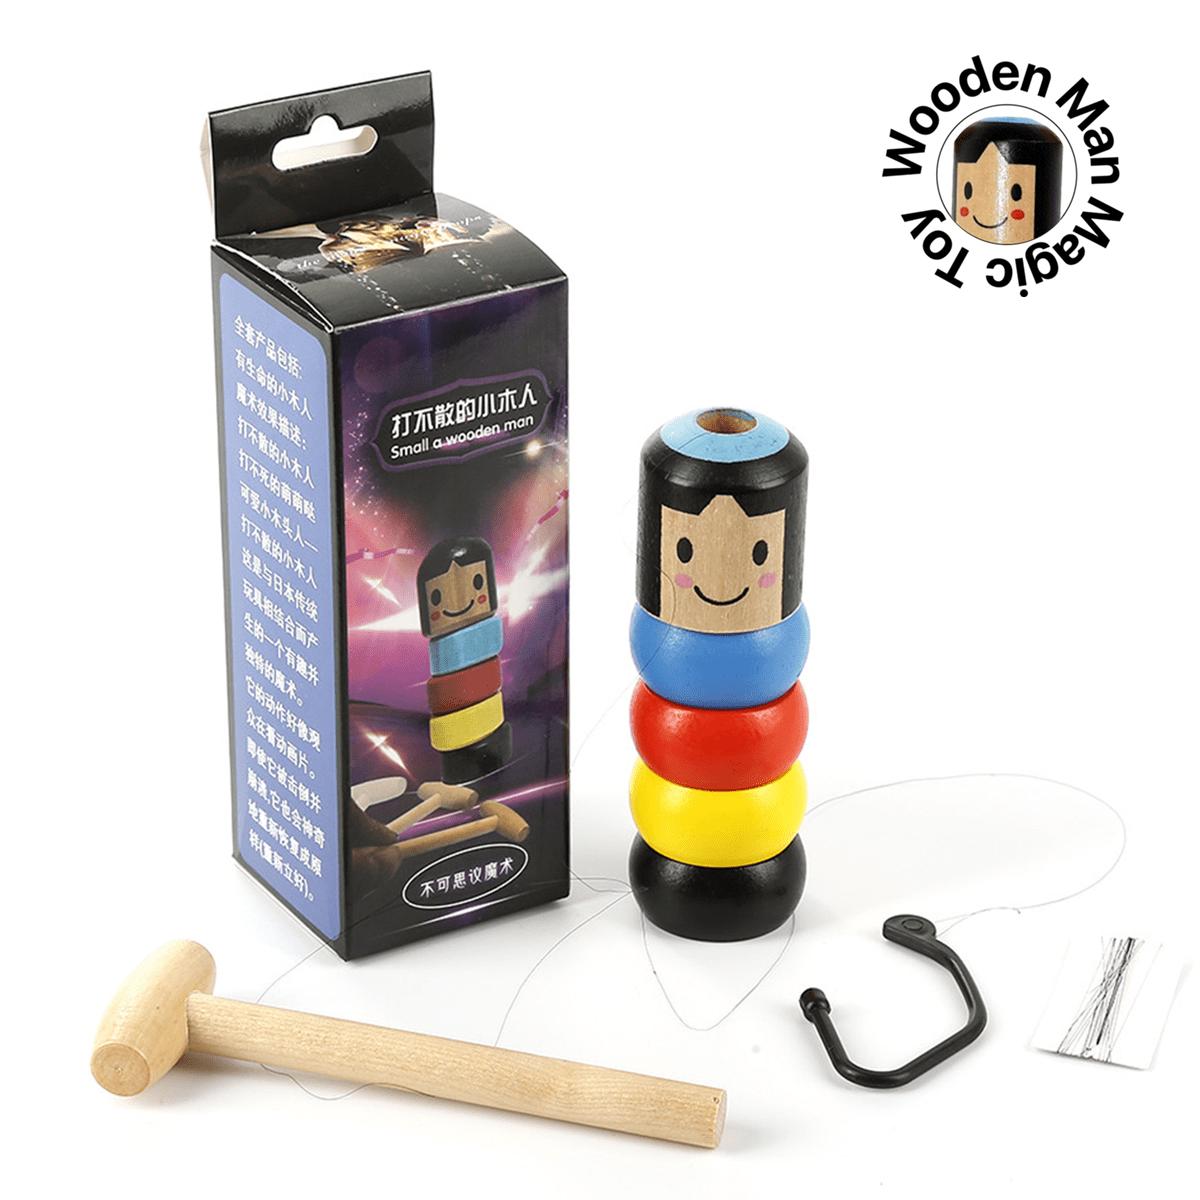 Unbreakable Small Wooden Man Immortal Daruma Stubborn Wood Magic Toy Kids Gifts